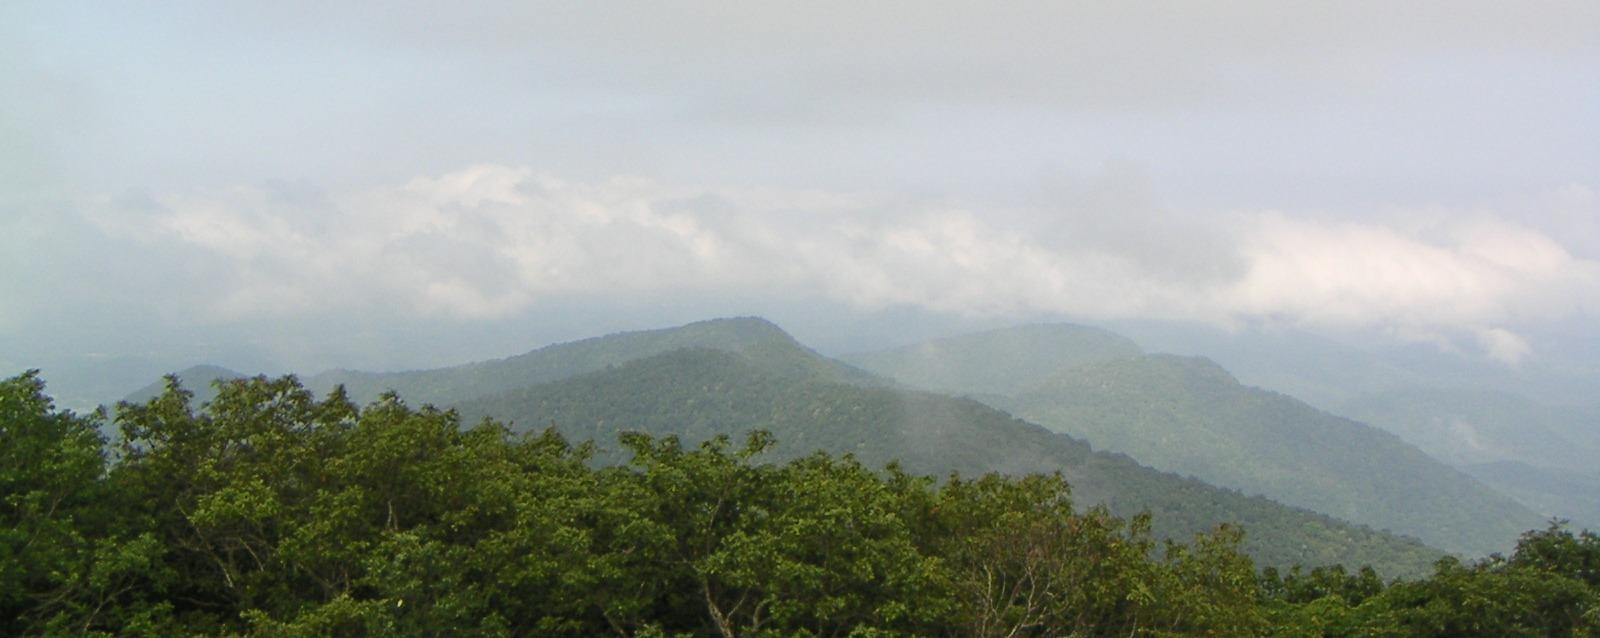 Description north georgia mountains